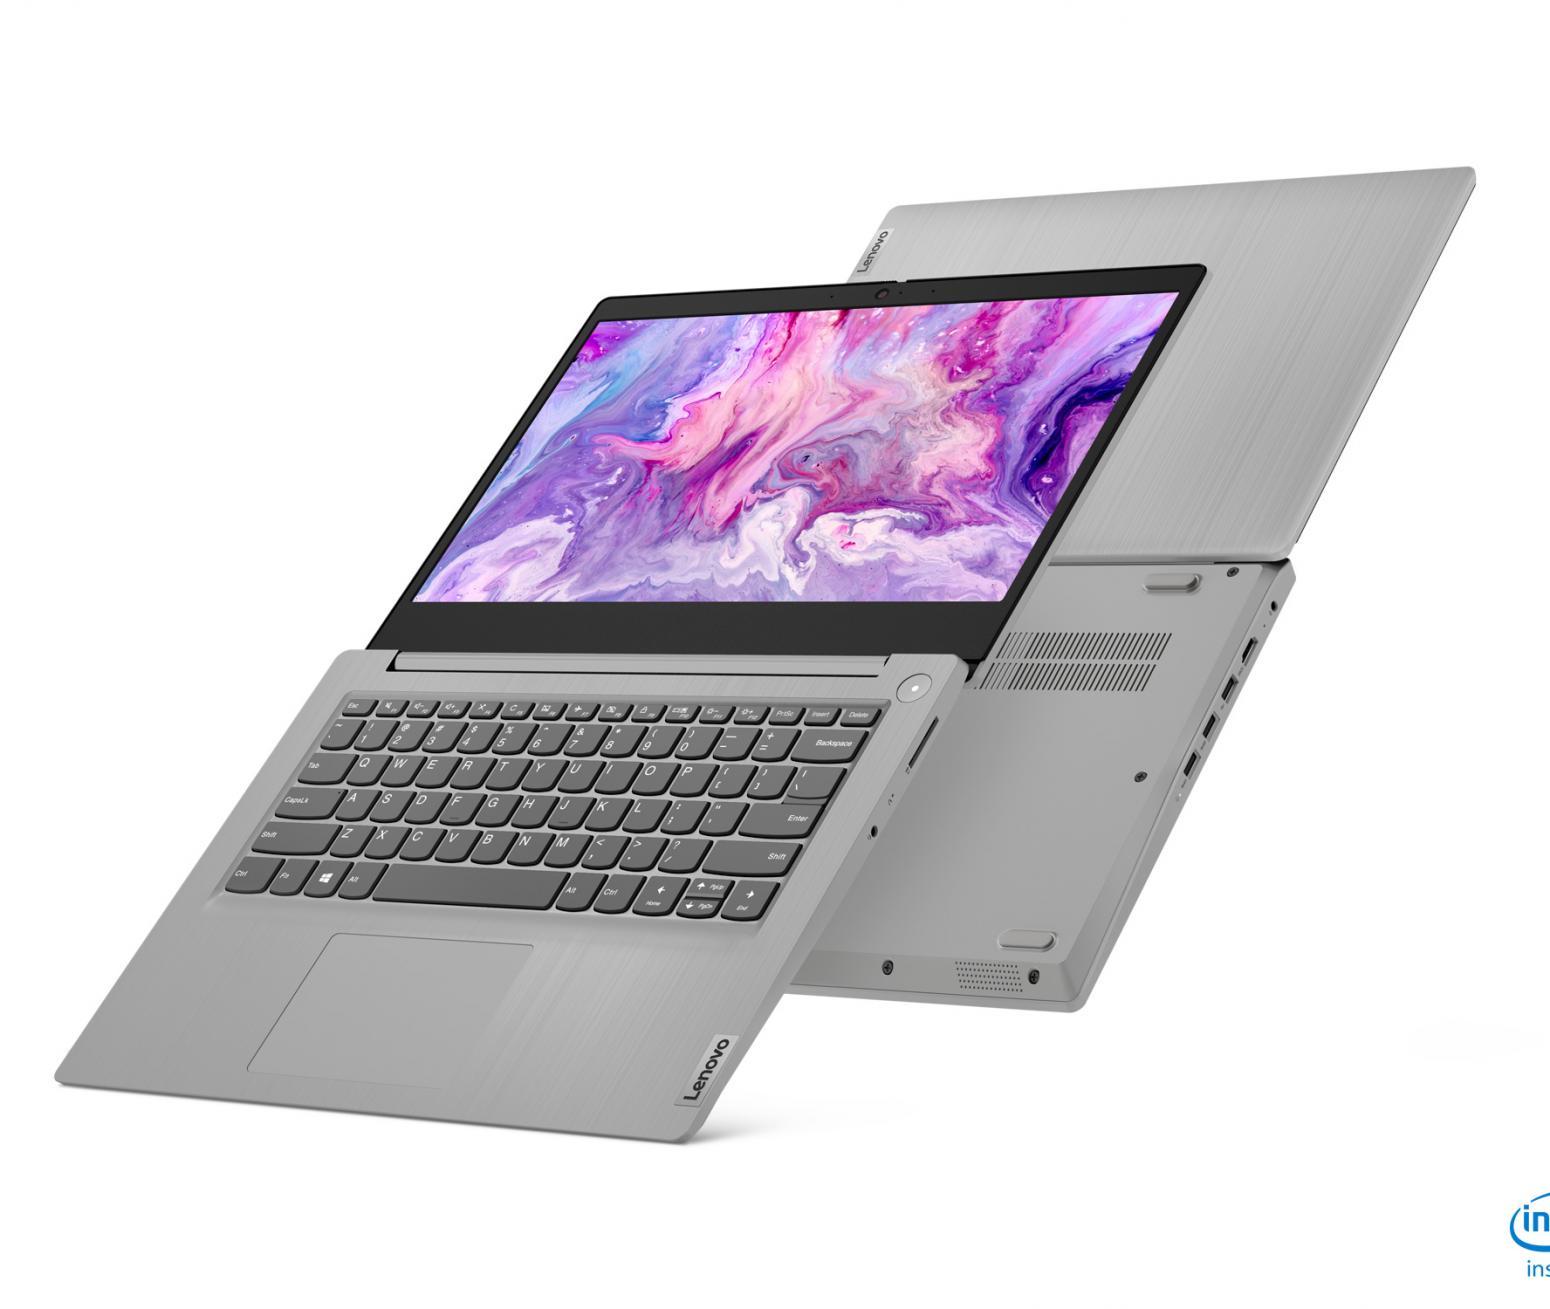 Ordinateur portable Lenovo IdeaPad 3 14IIL05 (81WD00EYFR) Argent - photo 4